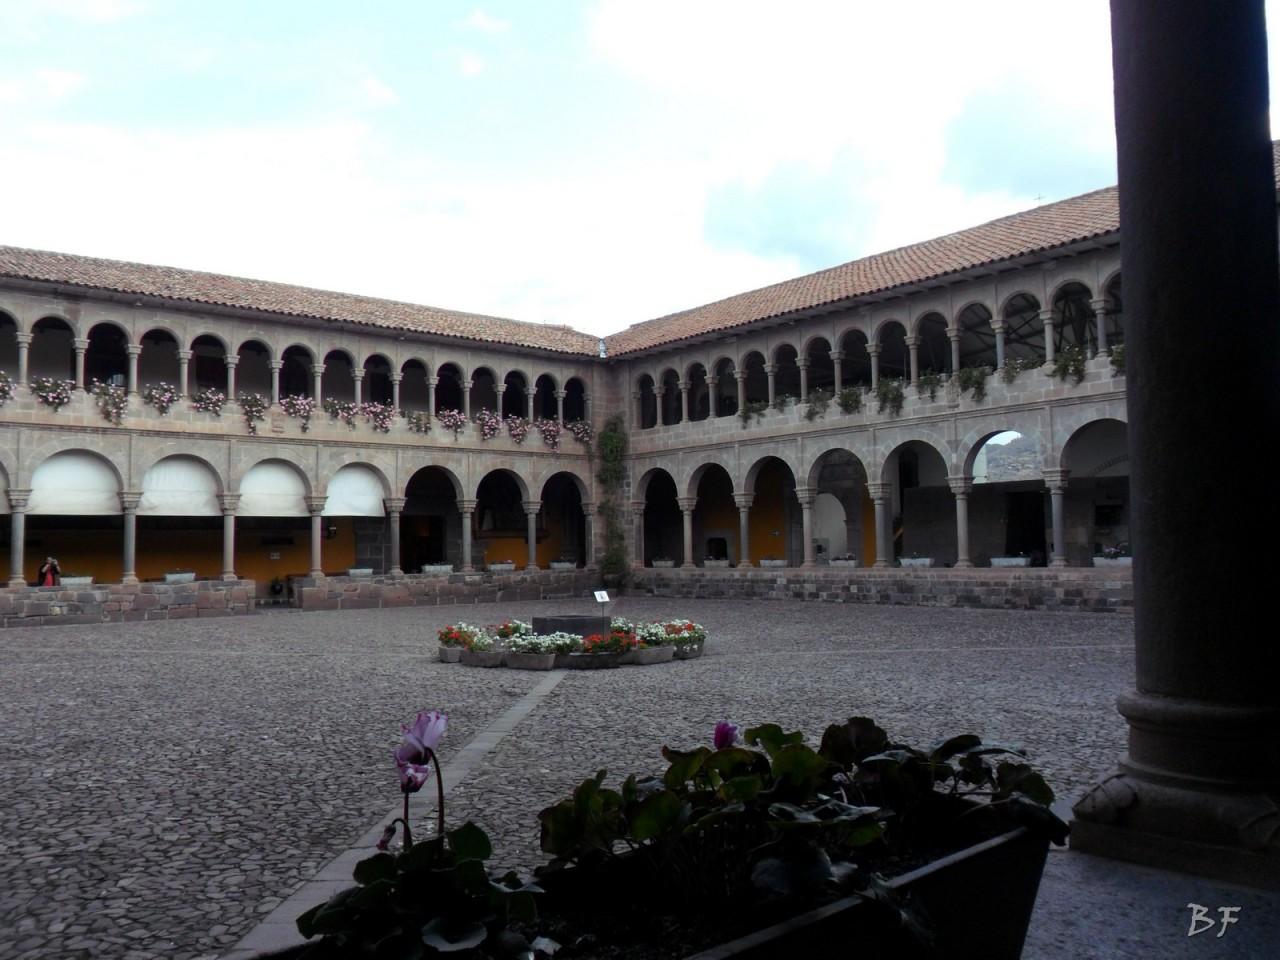 Mura-Poligonali-Megaliti-Tempio-Coricancha-Cusco-Perù-20